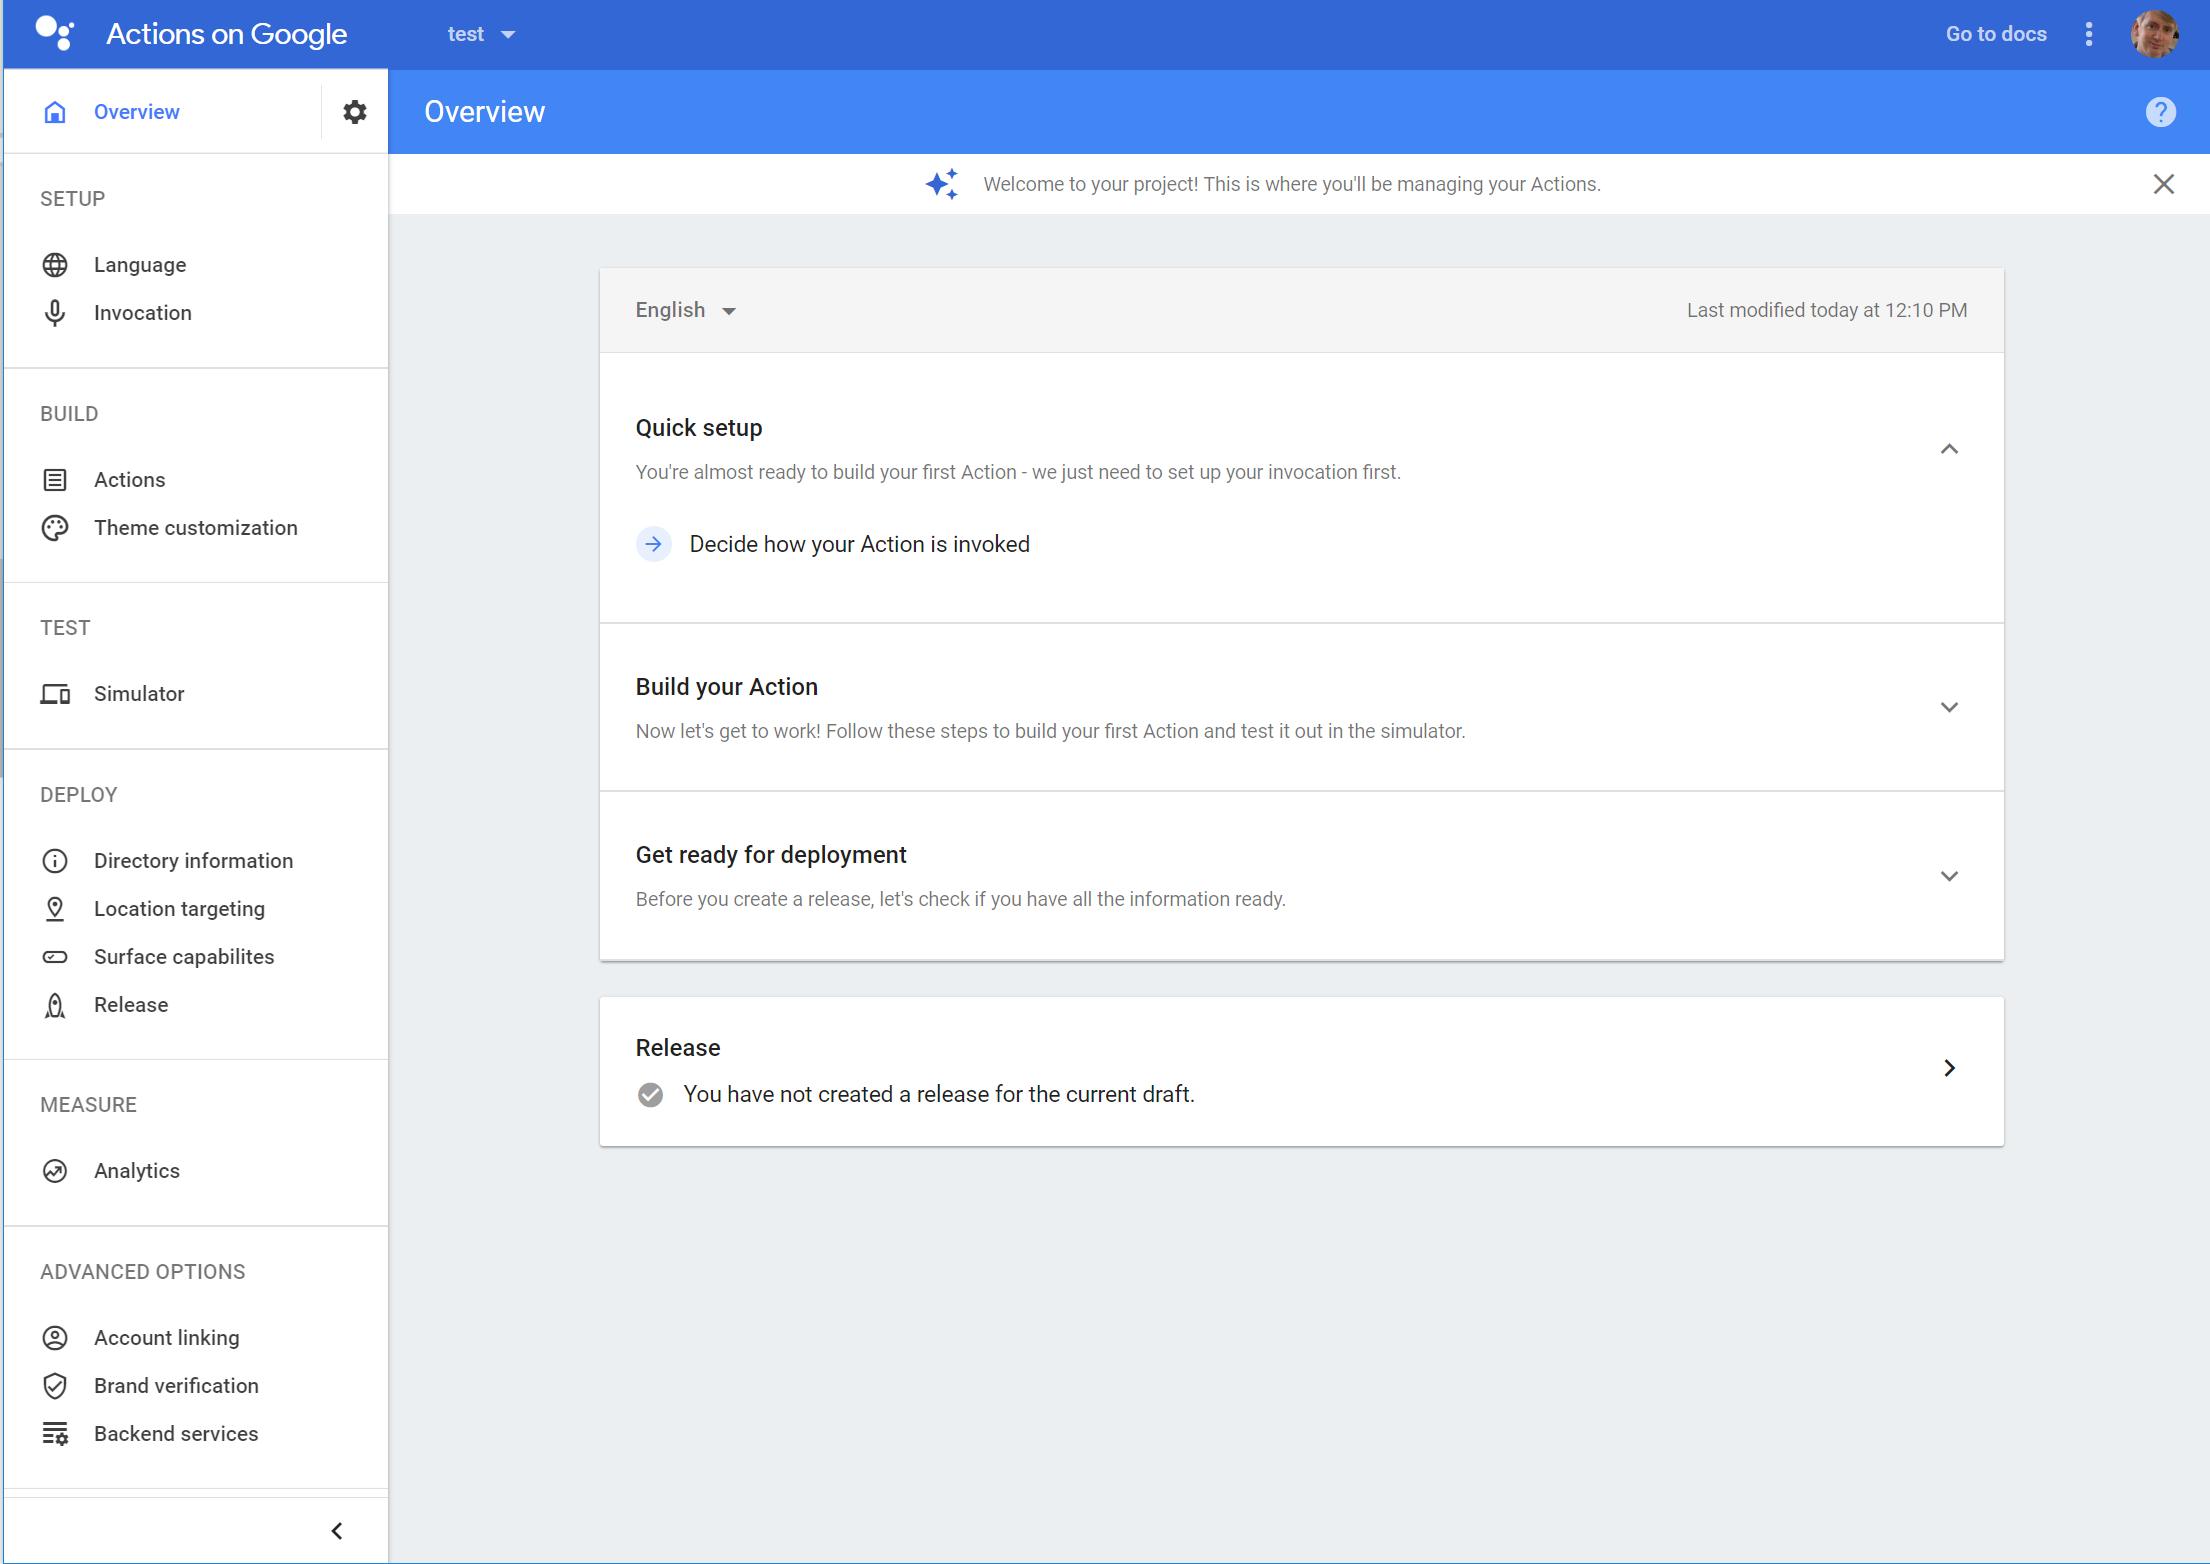 My First Google Assistant App (Part 2) | Alan Kent's Blog